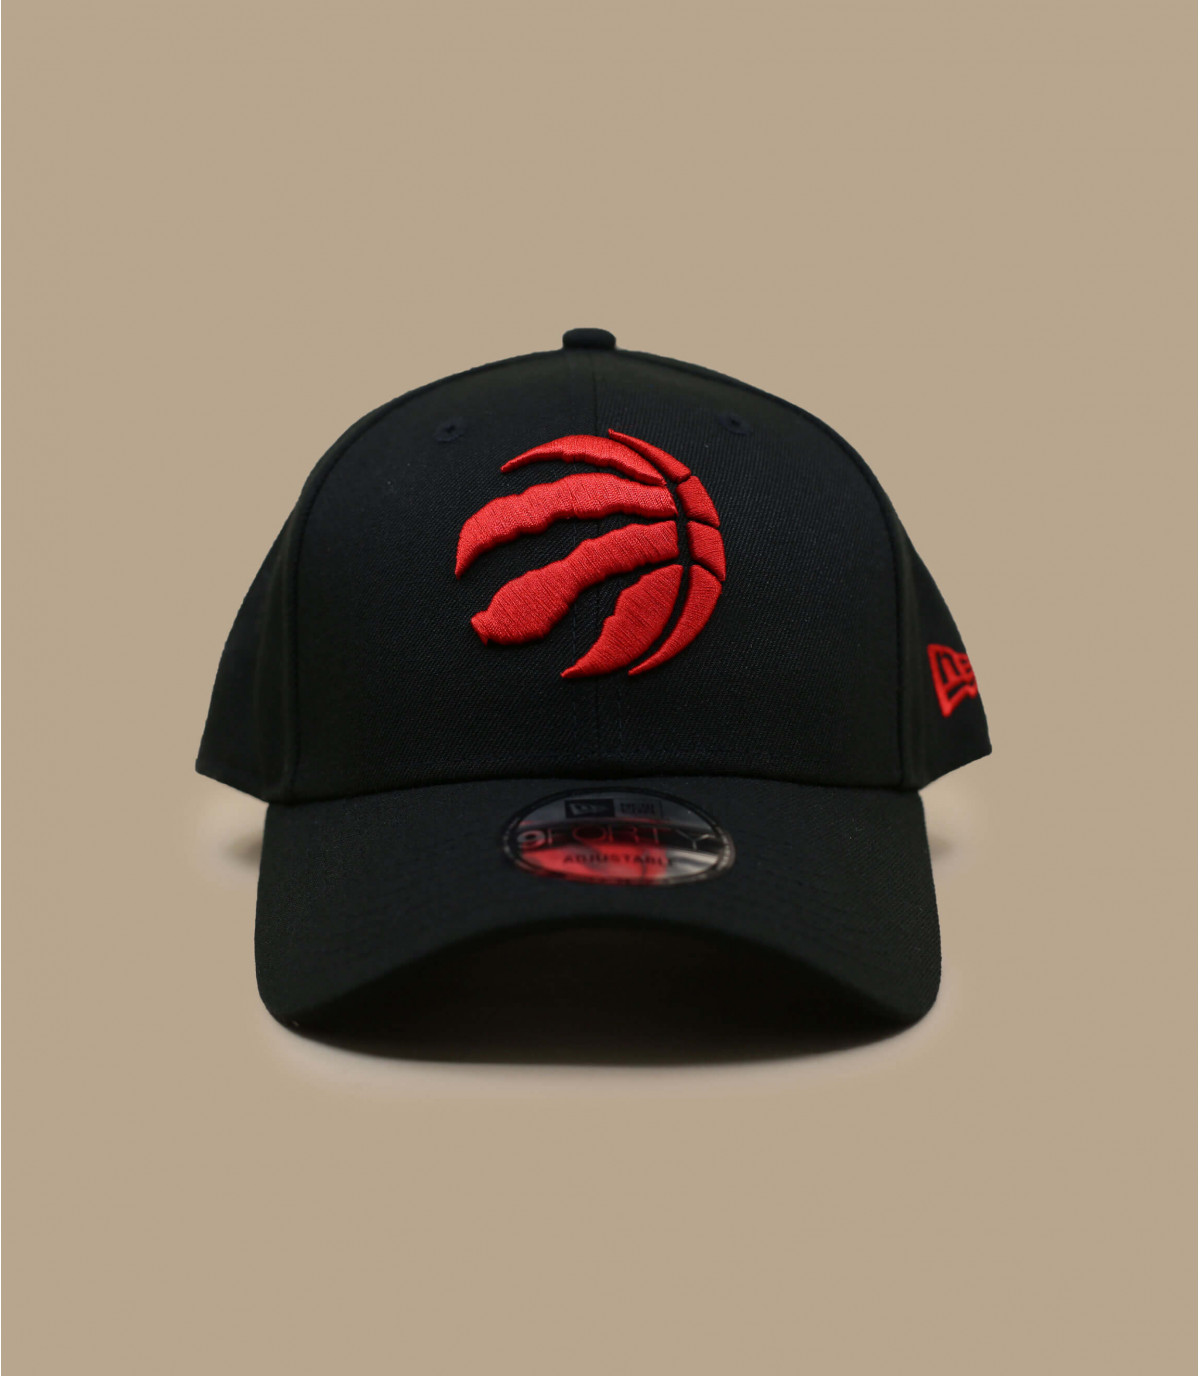 curva de tapa de Toronto Raptors de la NBA